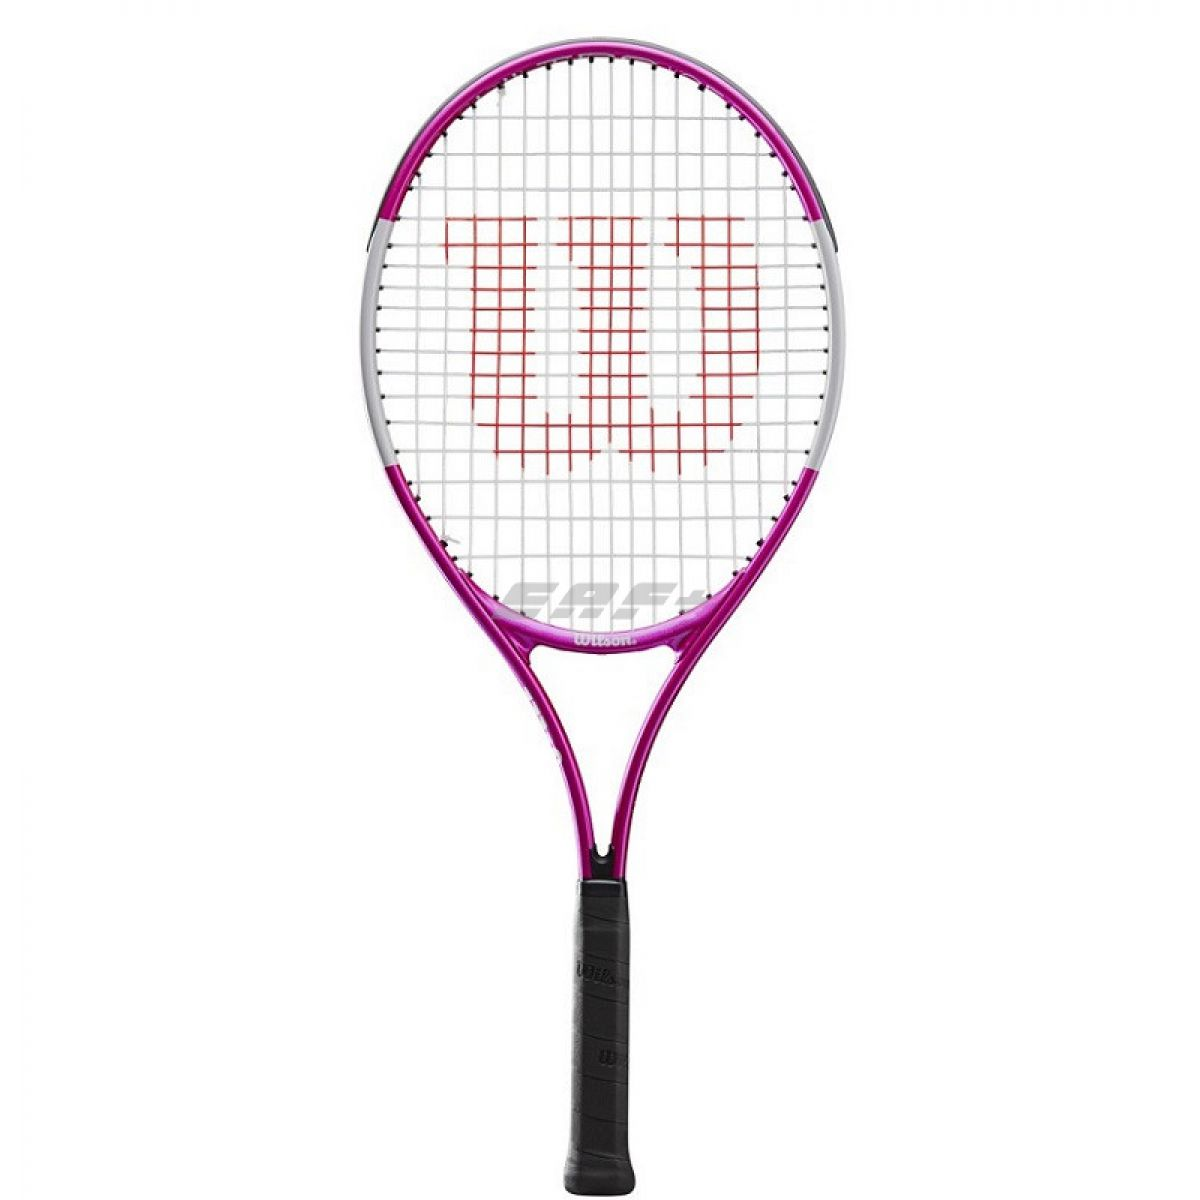 Ракетка теннисная Ракетка б/т Wilson Ultra Pink25 GR00, арт.WR027810U, для 9-10 лет, алюминий,со струнами,роз-бел-черн